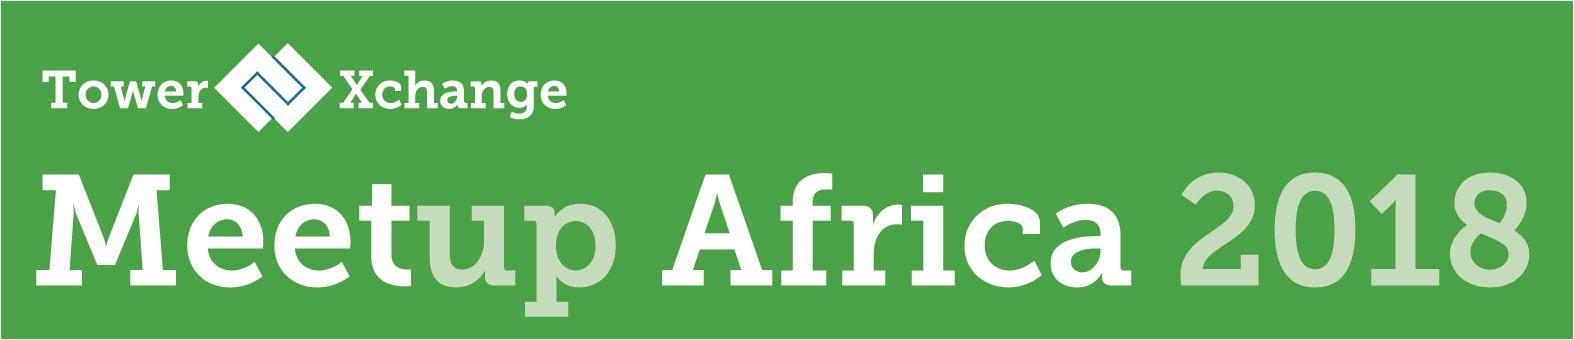 TowerXchange Africa